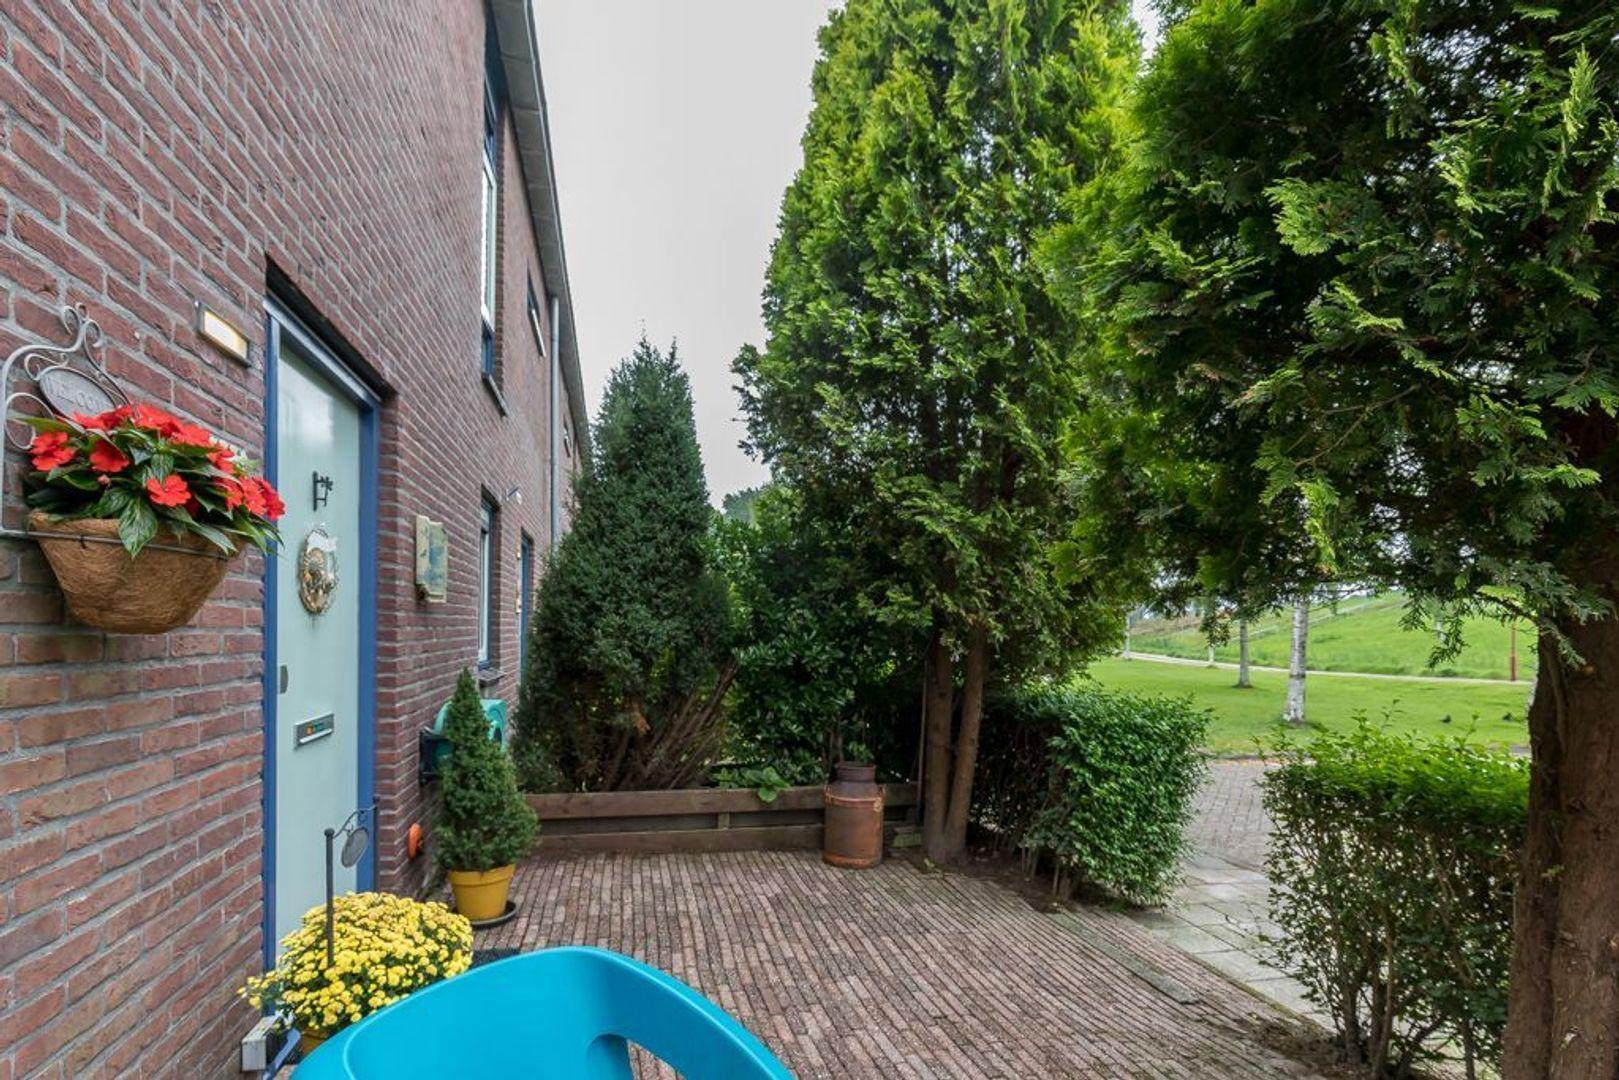 Balsahout 15, Zoetermeer foto-38